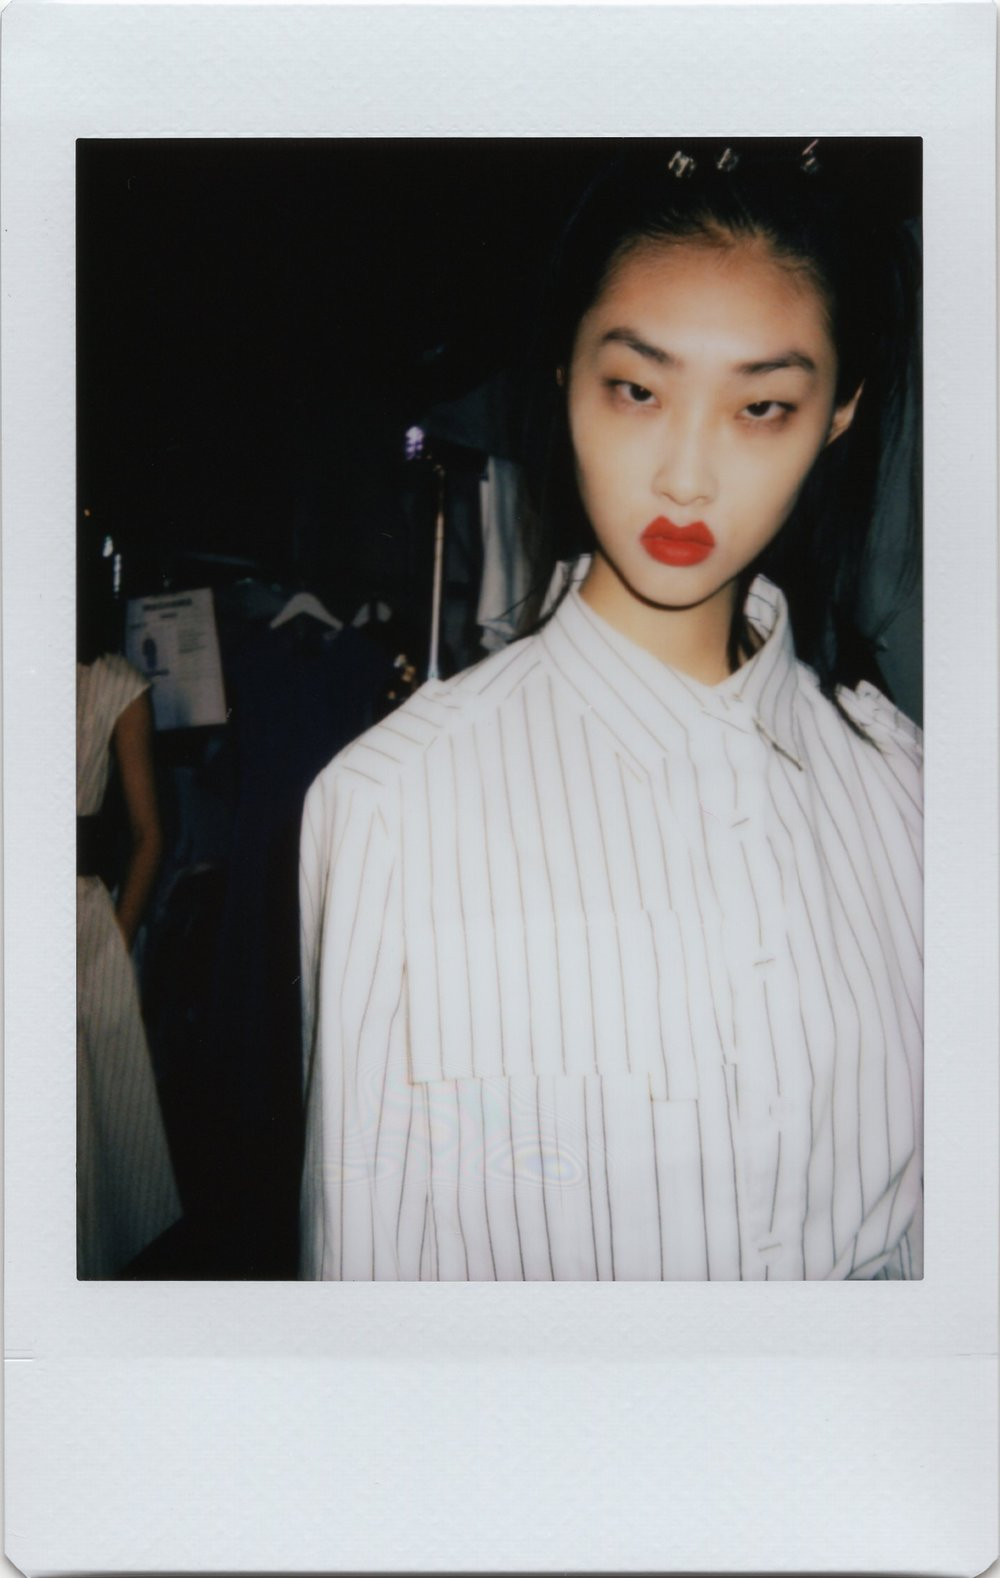 Mashama_Honigschreck_Backstage_Polaroid_7.jpg